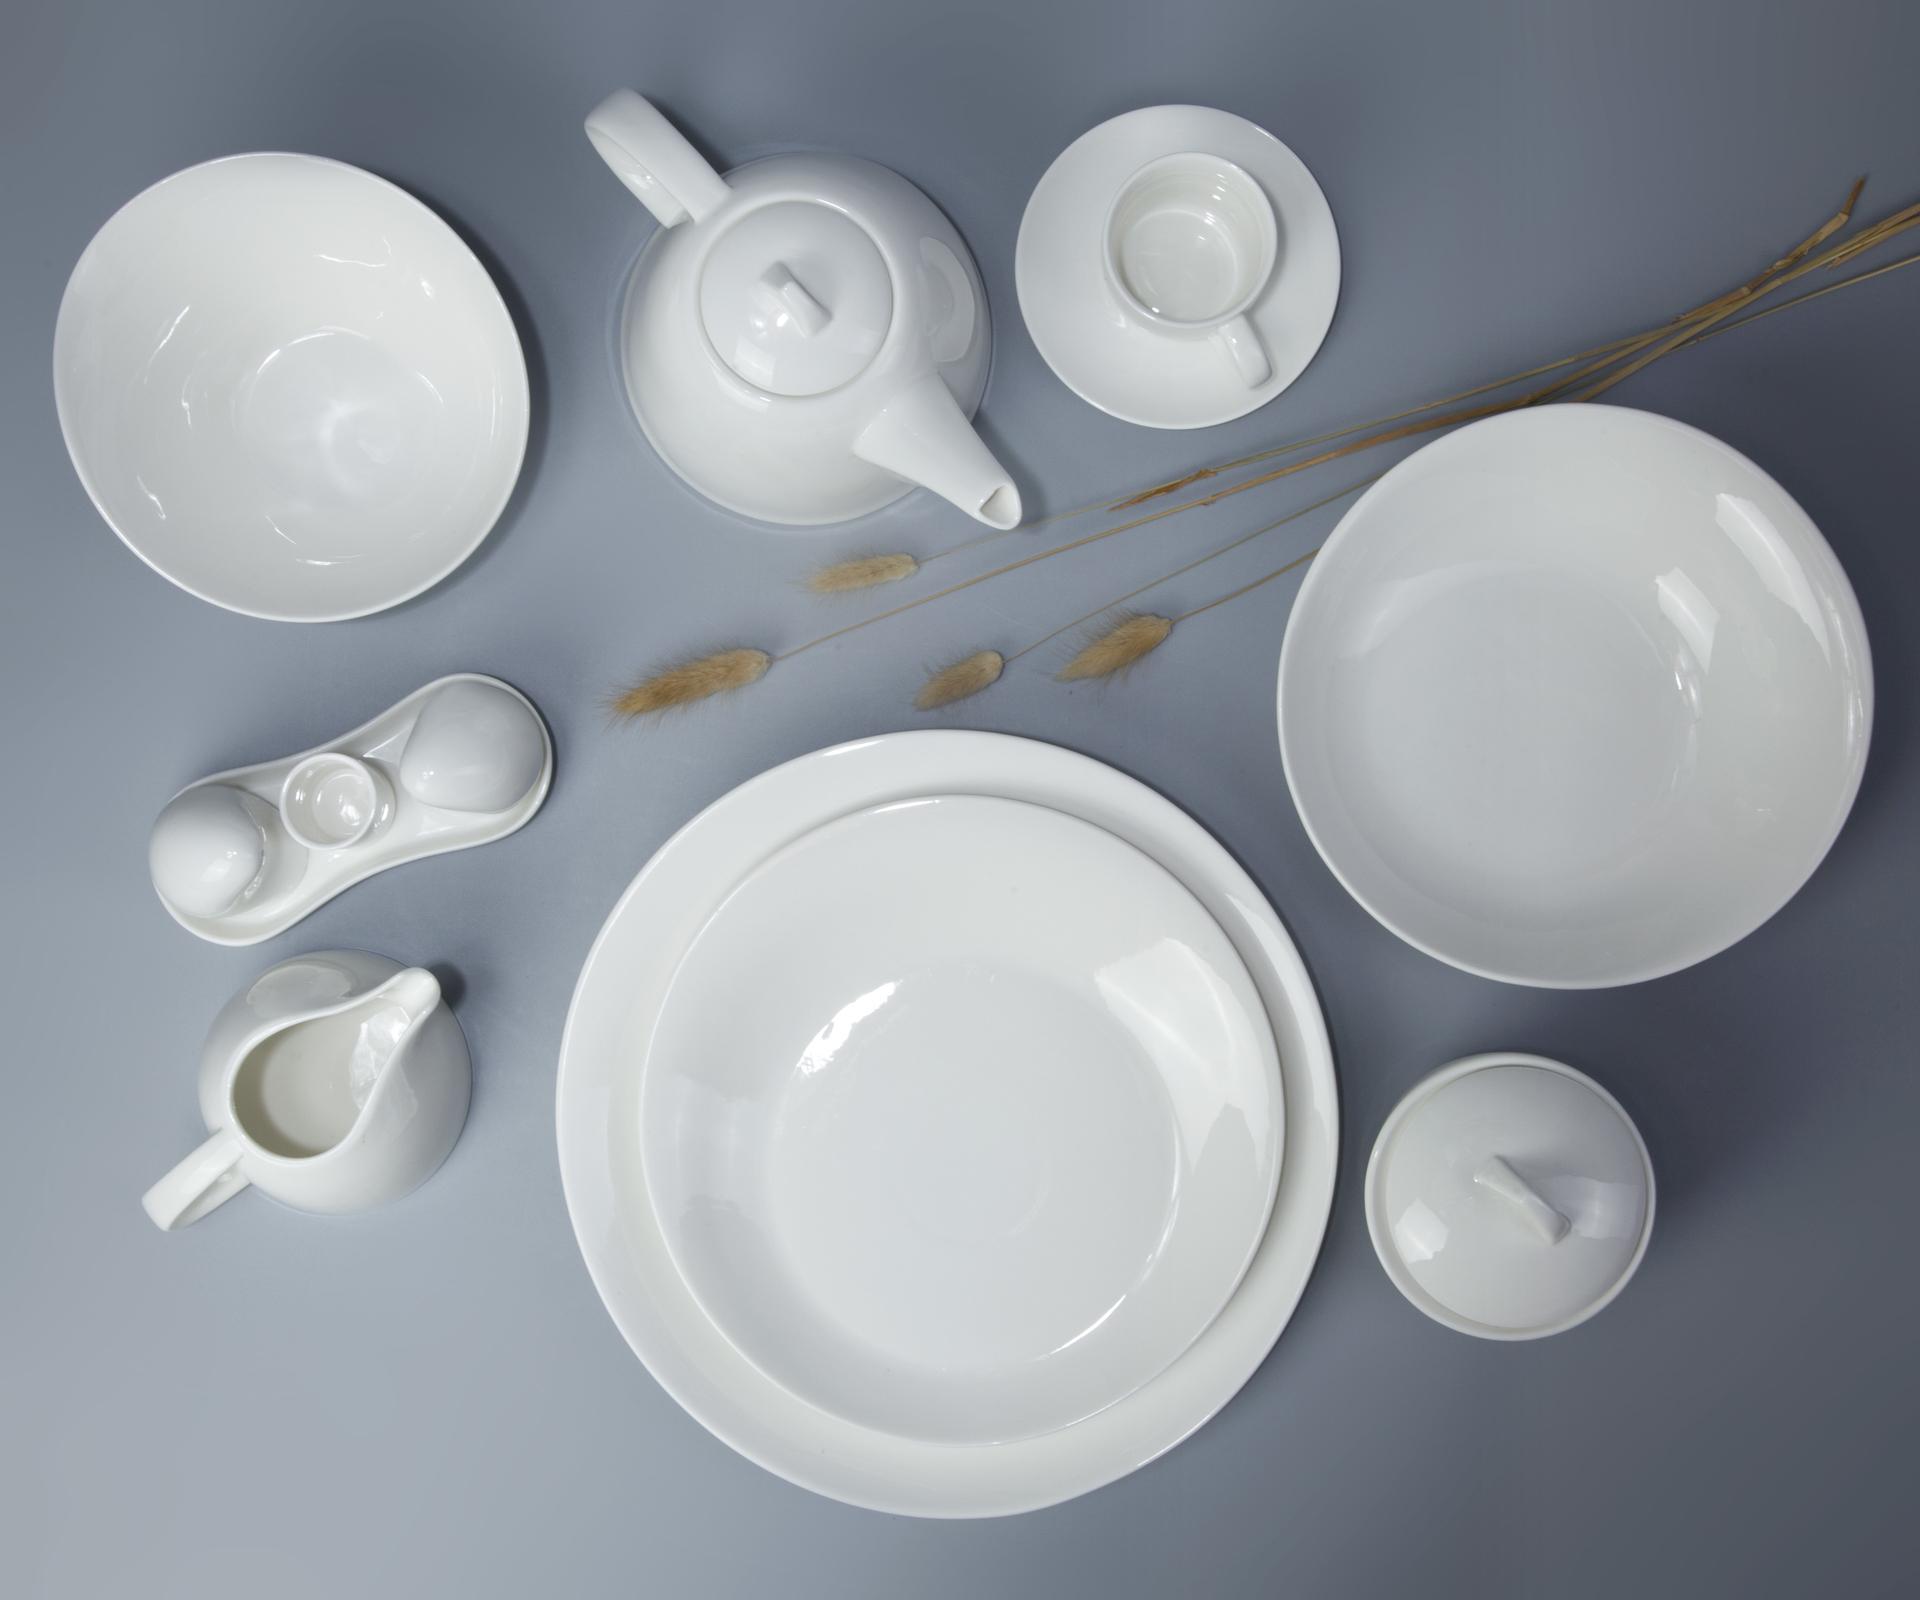 Hotel Tableware Supplierd Tableware Importer FDA,CIQ,CE Certificate Buffet Set Unique Dinnerware Sets